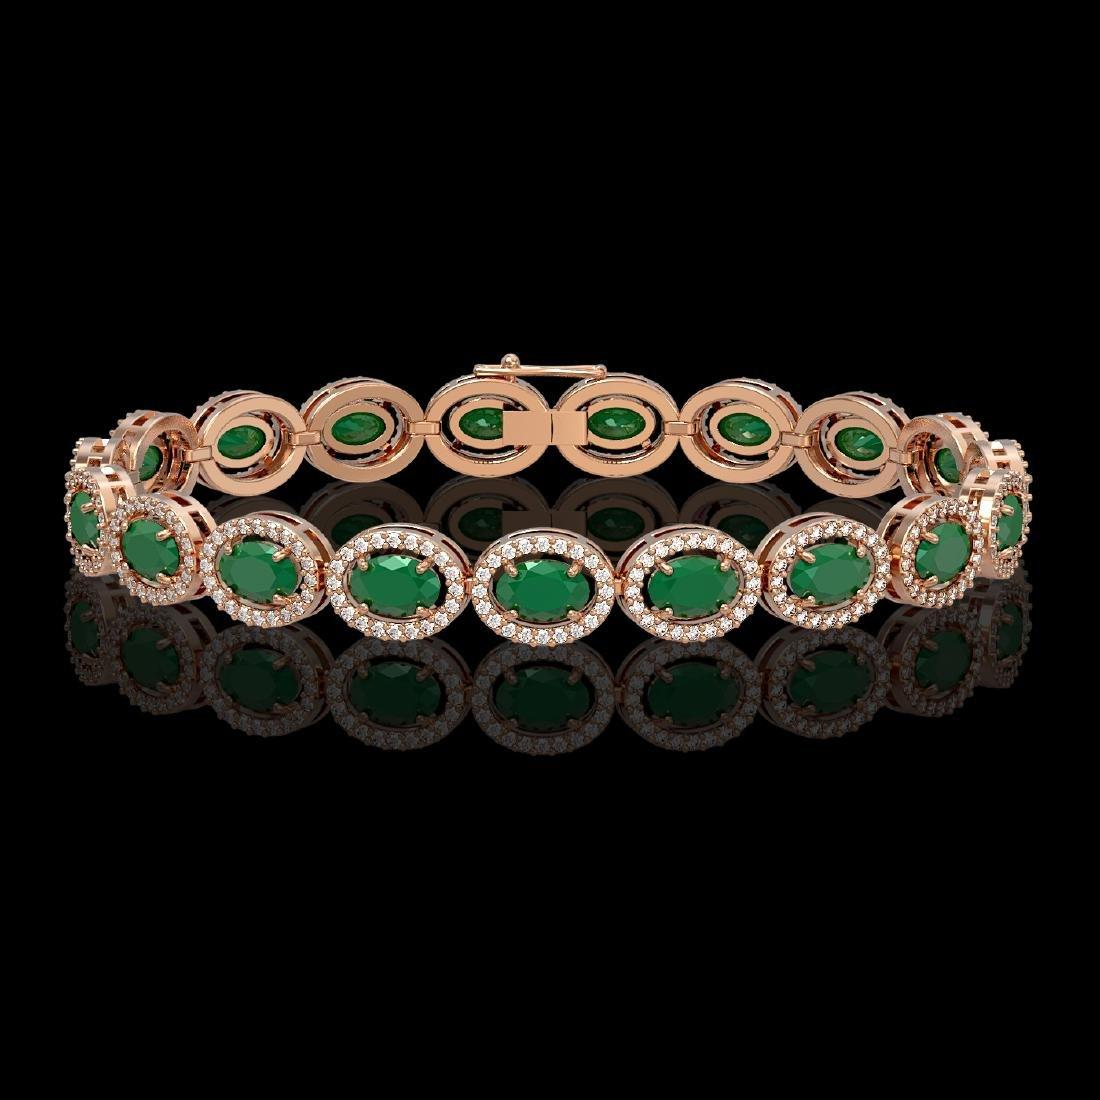 15.2 CTW Emerald & Diamond Halo Bracelet 10K Rose Gold